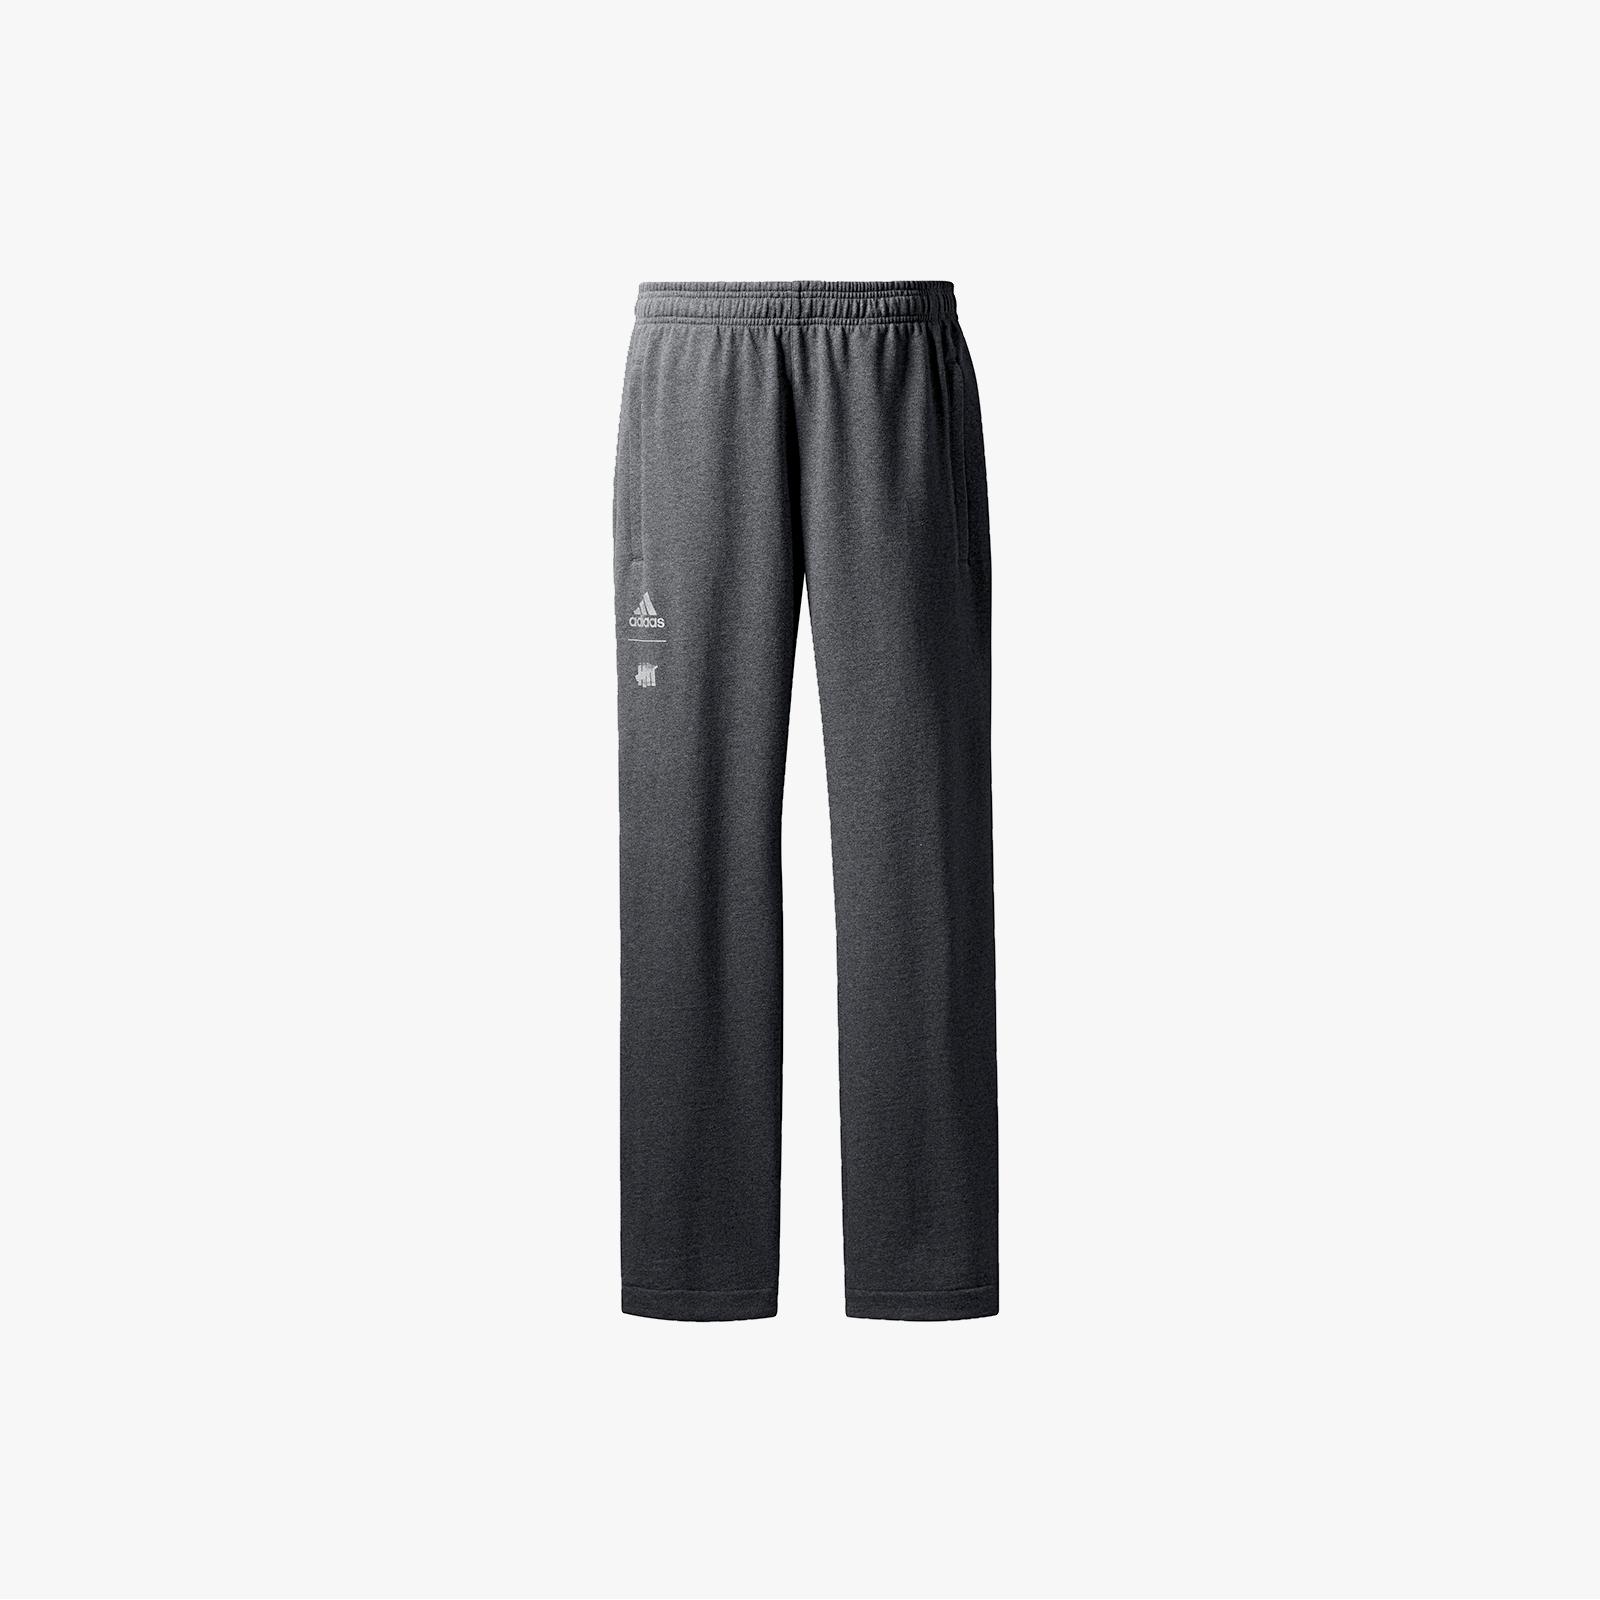 on sale 2125a a416d adidas Originals Tech Sweatpant x UNDFTD